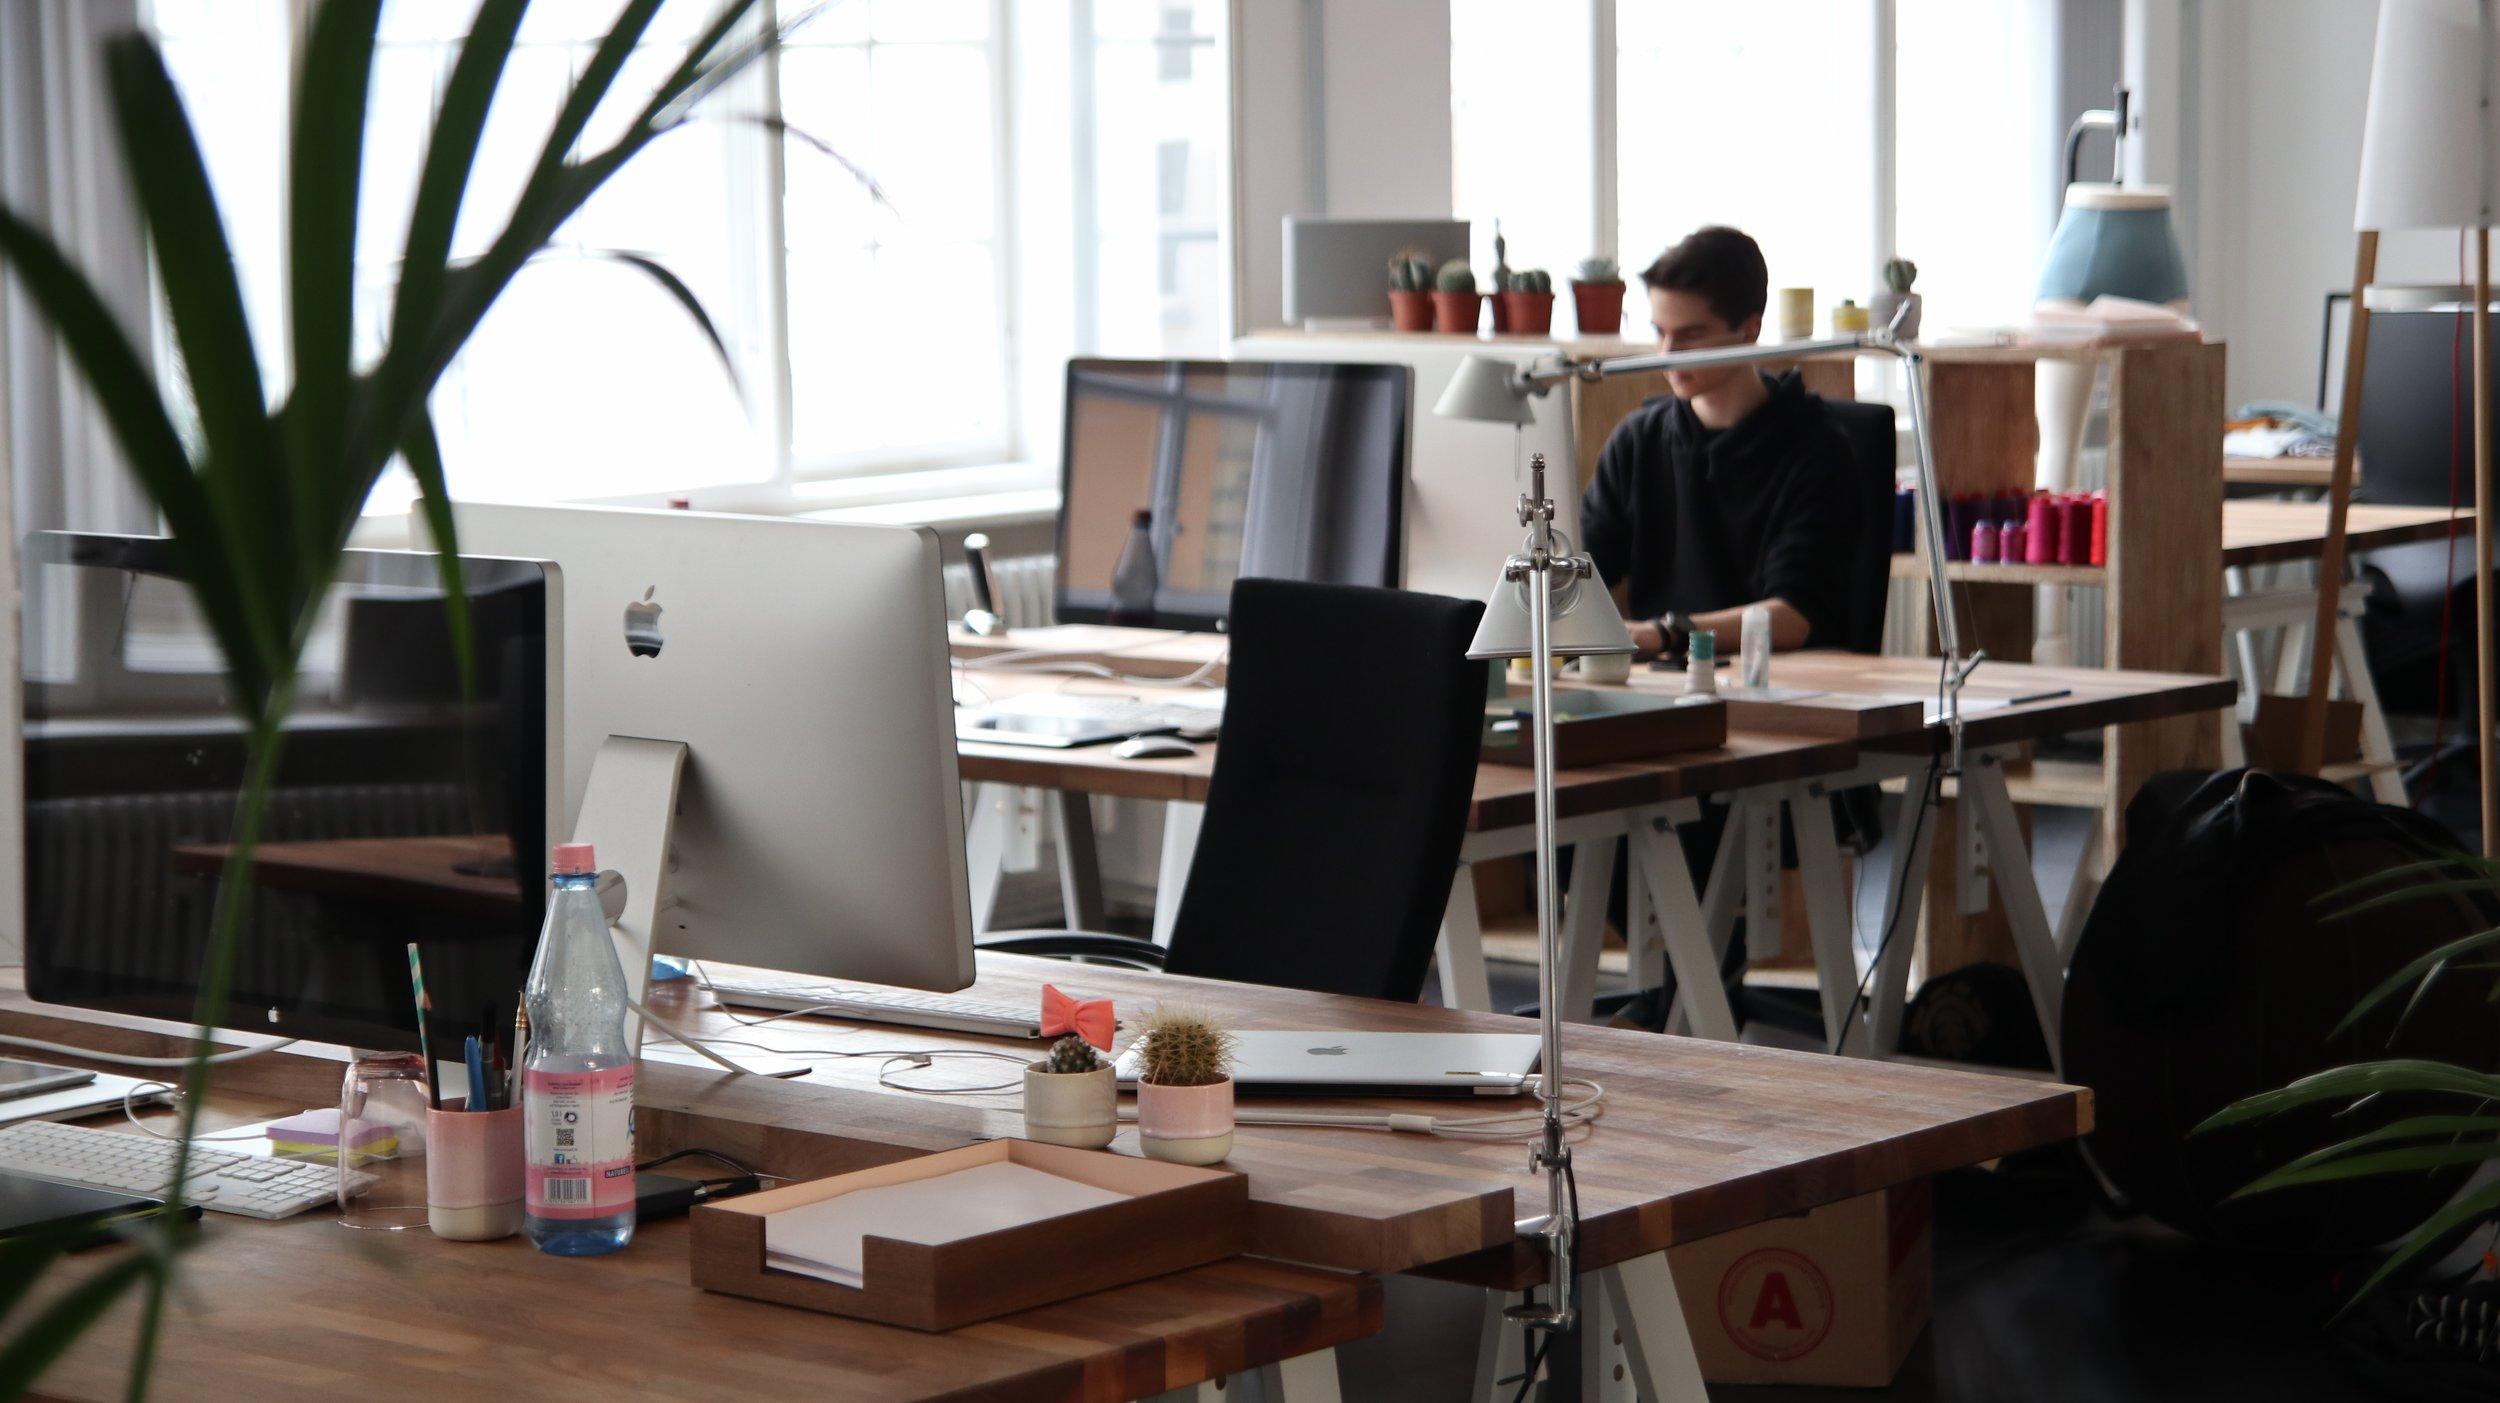 adult-agency-business-380769.jpg